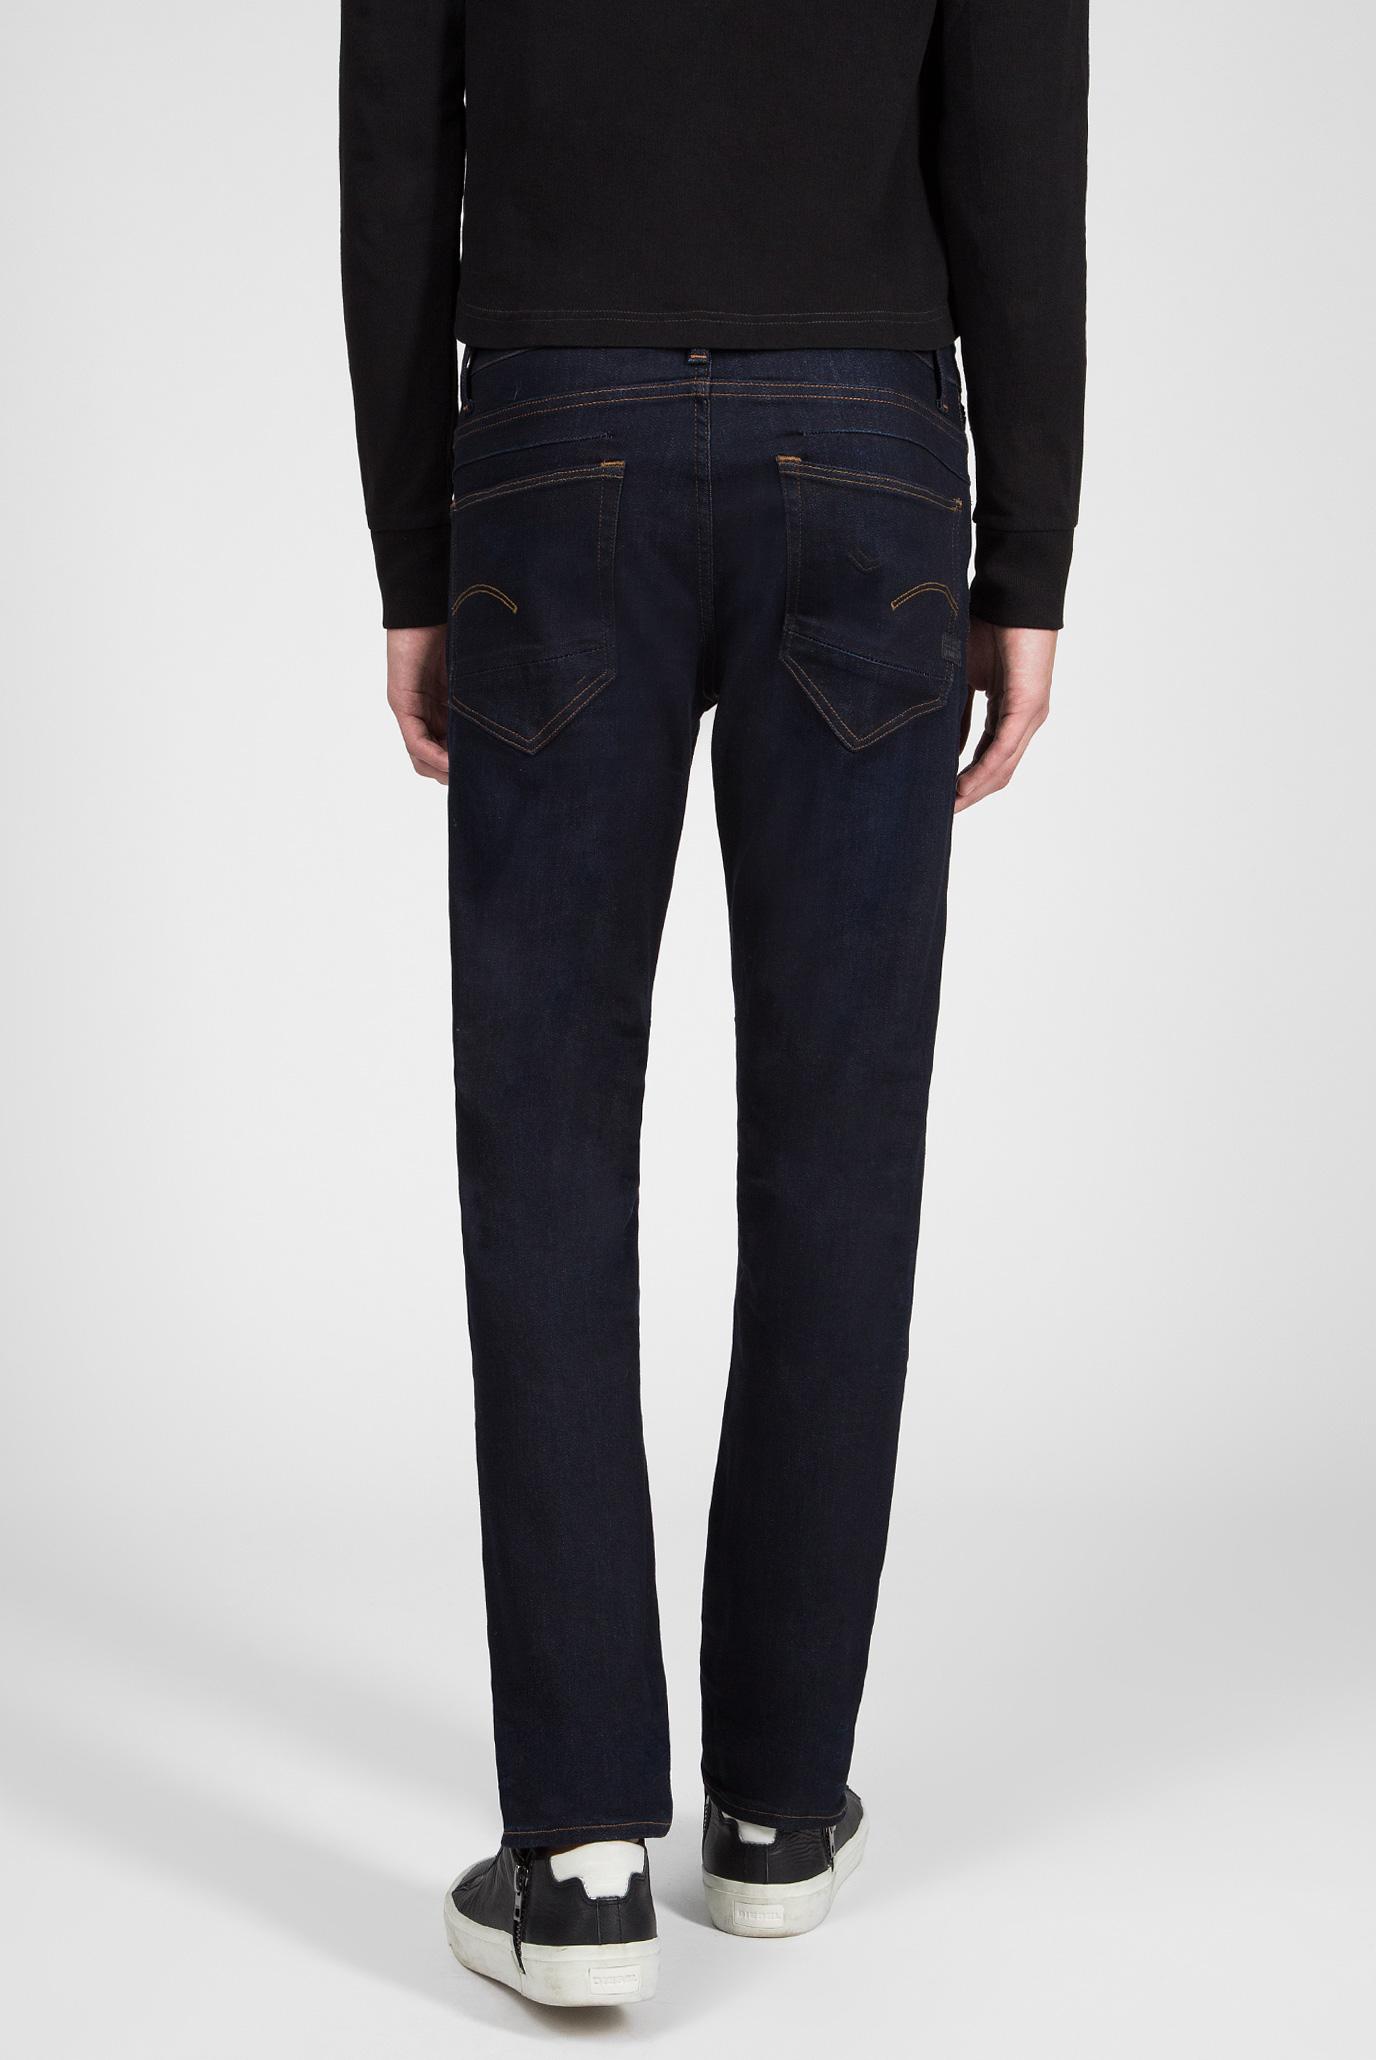 Купить Мужские темно-синие джинсы D-Staq 5-pkt Straight G-Star RAW G-Star RAW D09559,7209 – Киев, Украина. Цены в интернет магазине MD Fashion